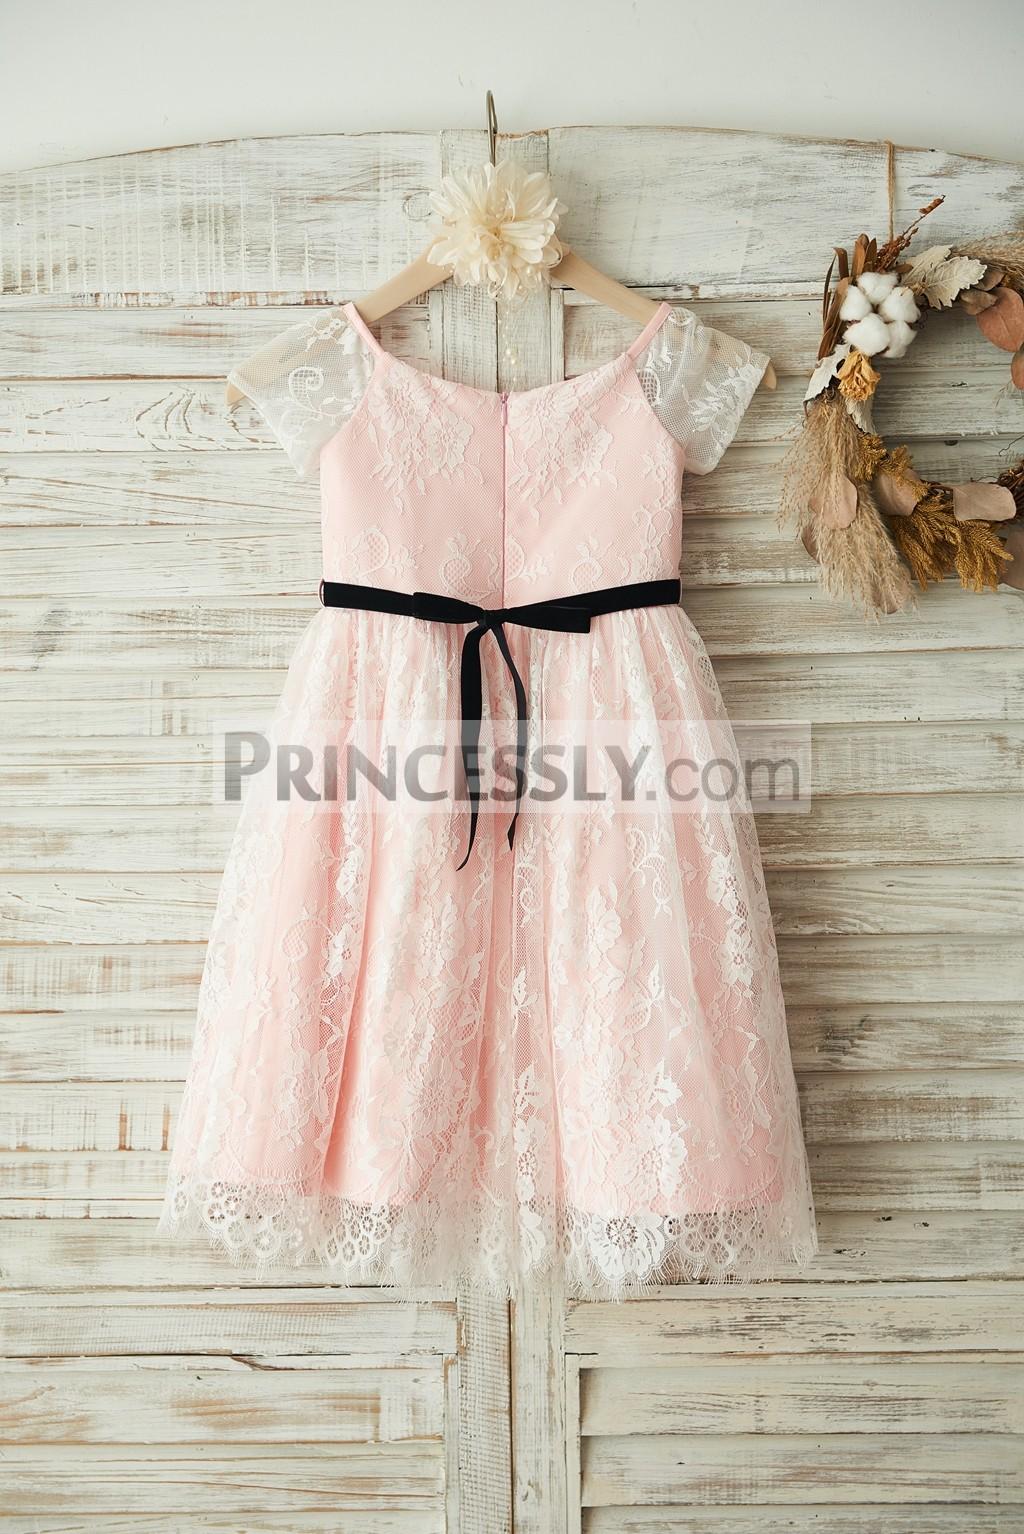 Ivory Lace Pink Satin Lining Wedding Baby Girl Dress